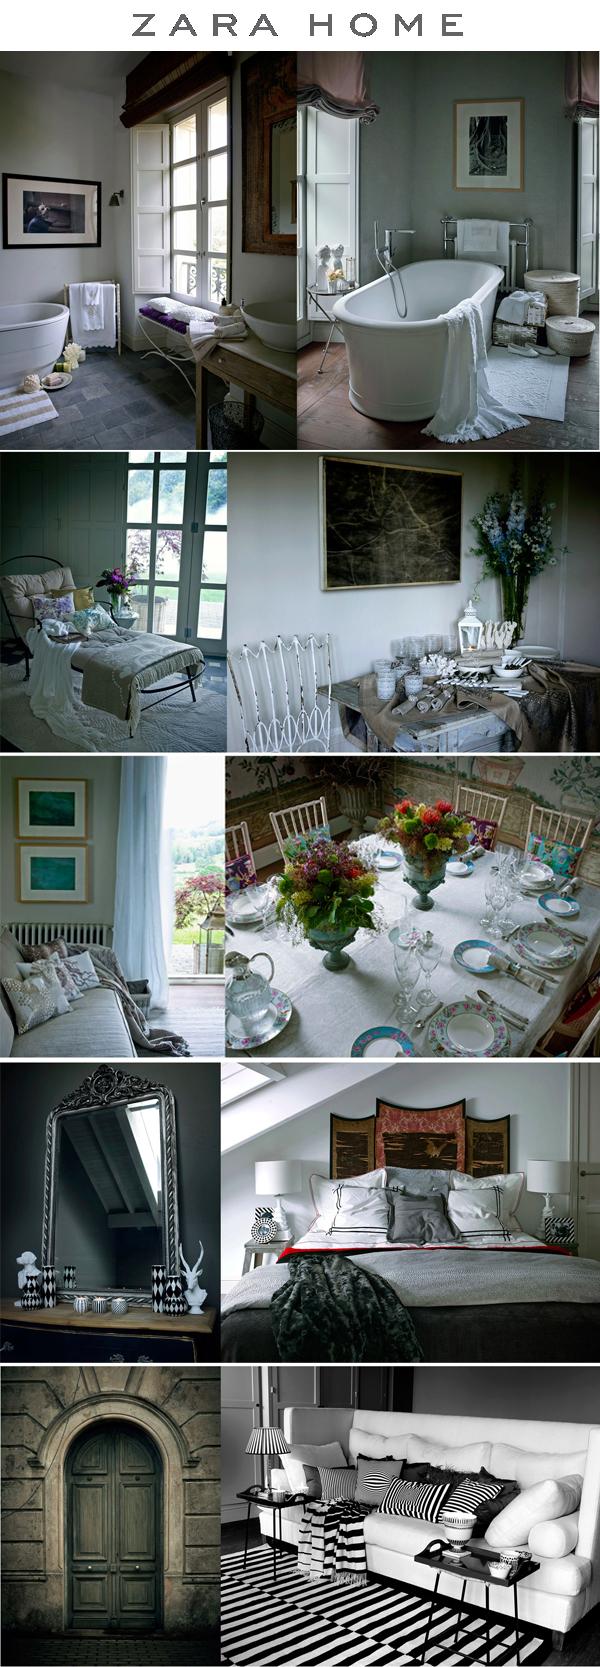 zara home arrive au canada l 39 an vert du d cor. Black Bedroom Furniture Sets. Home Design Ideas